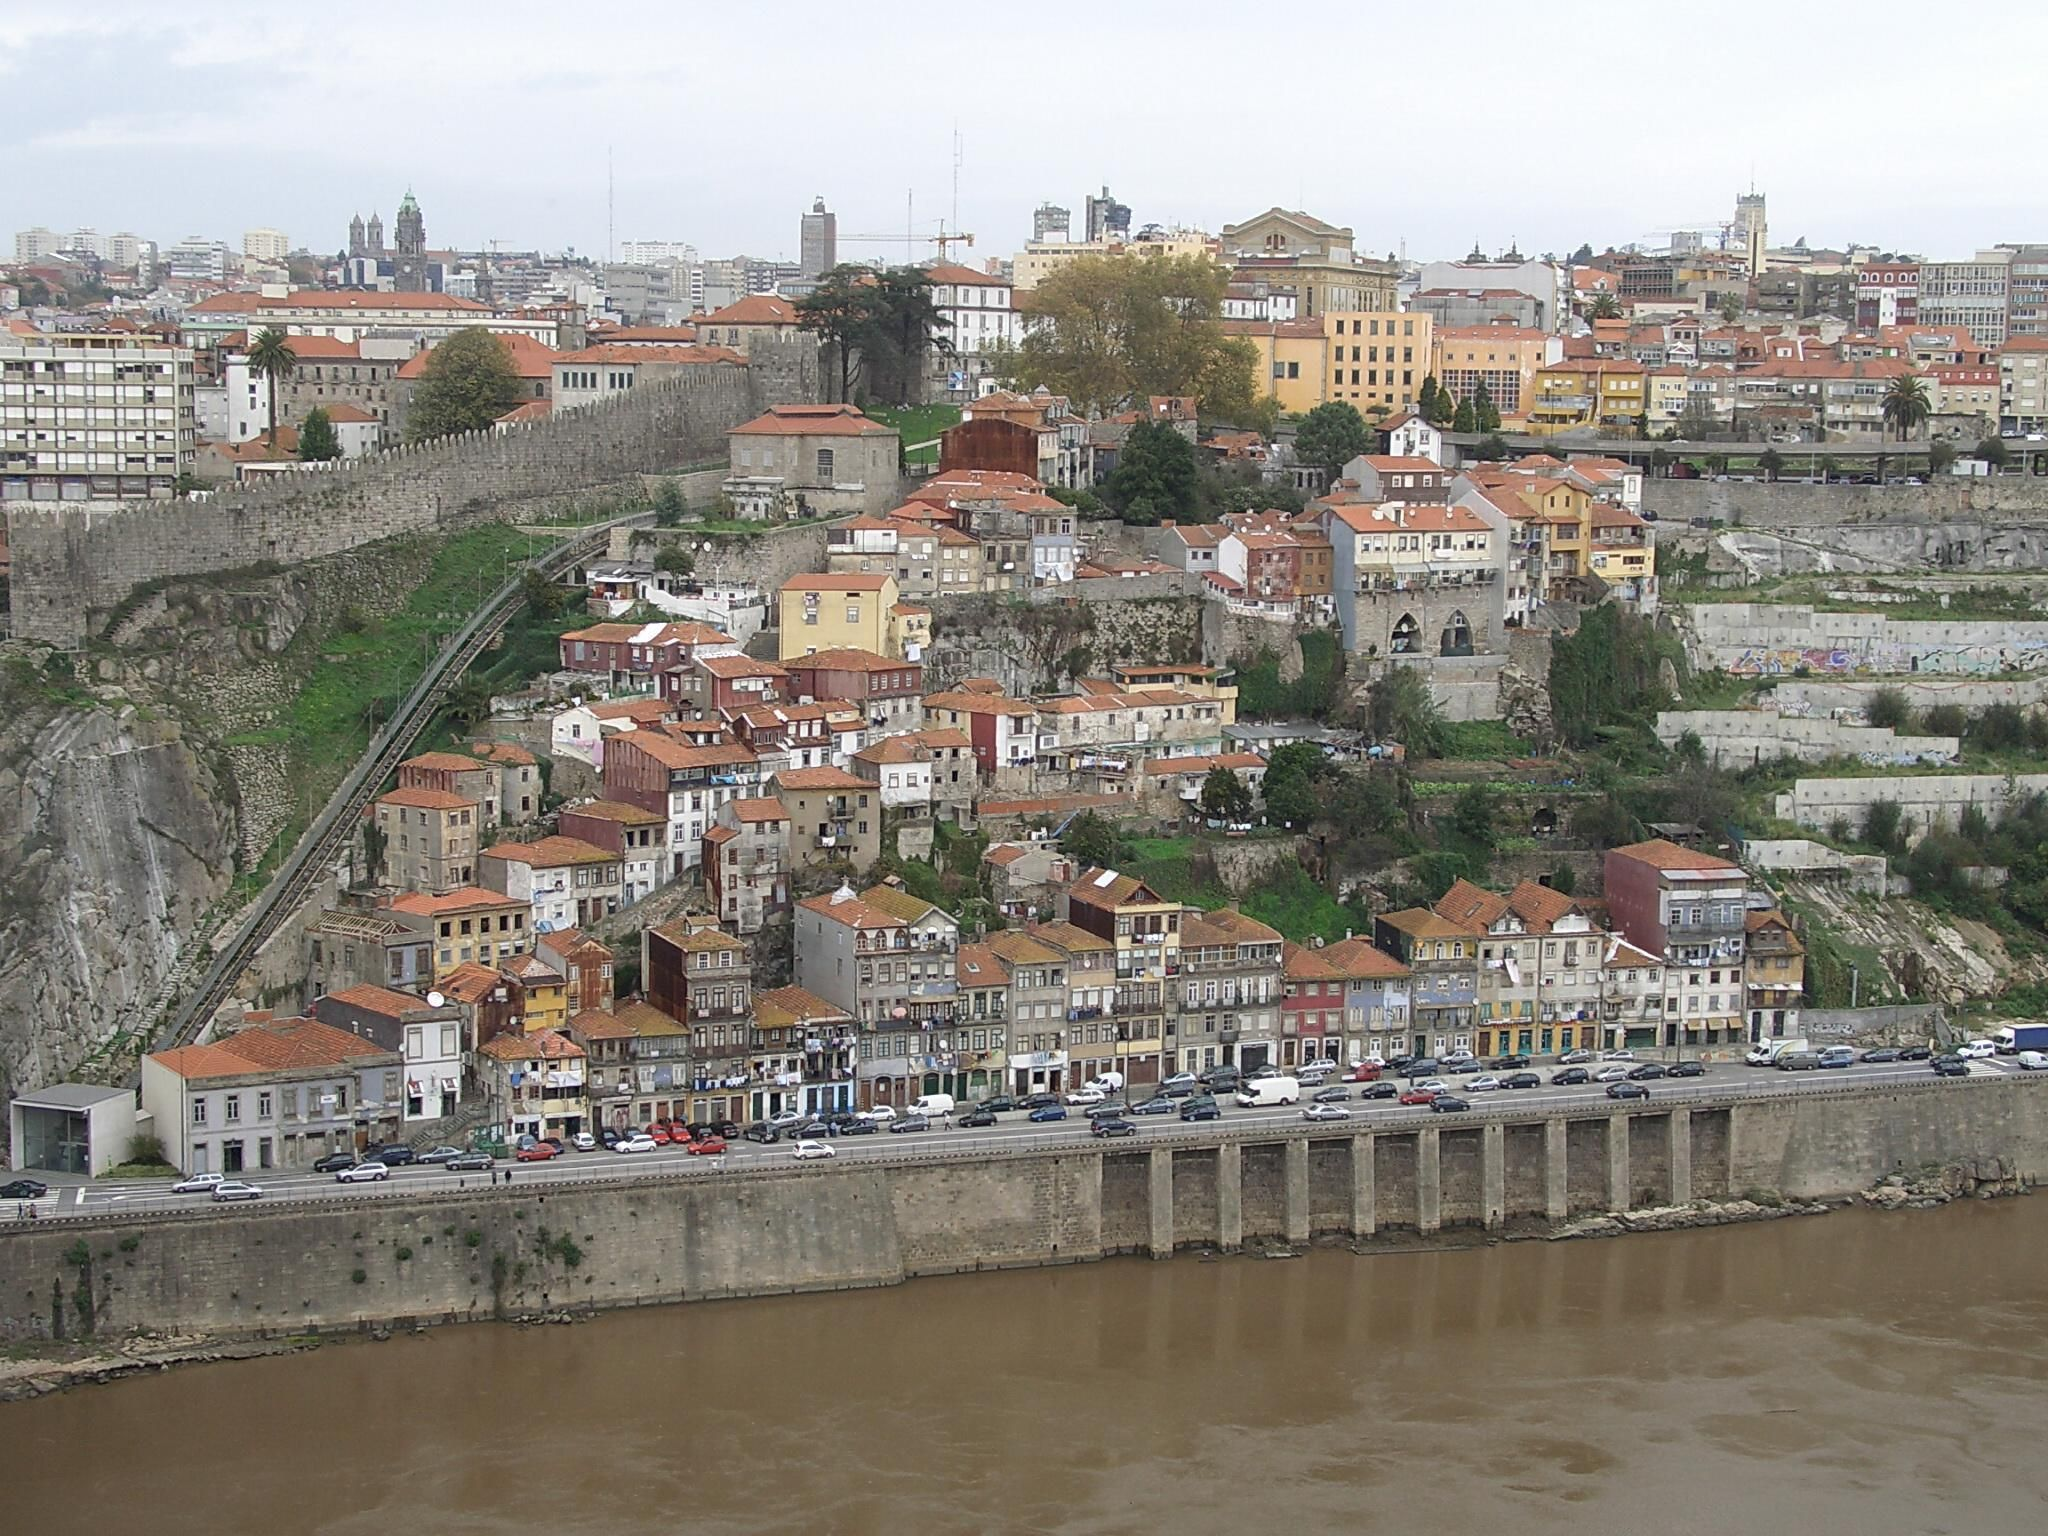 Fond d ecran portugal page 3 for Fond ecran portugal